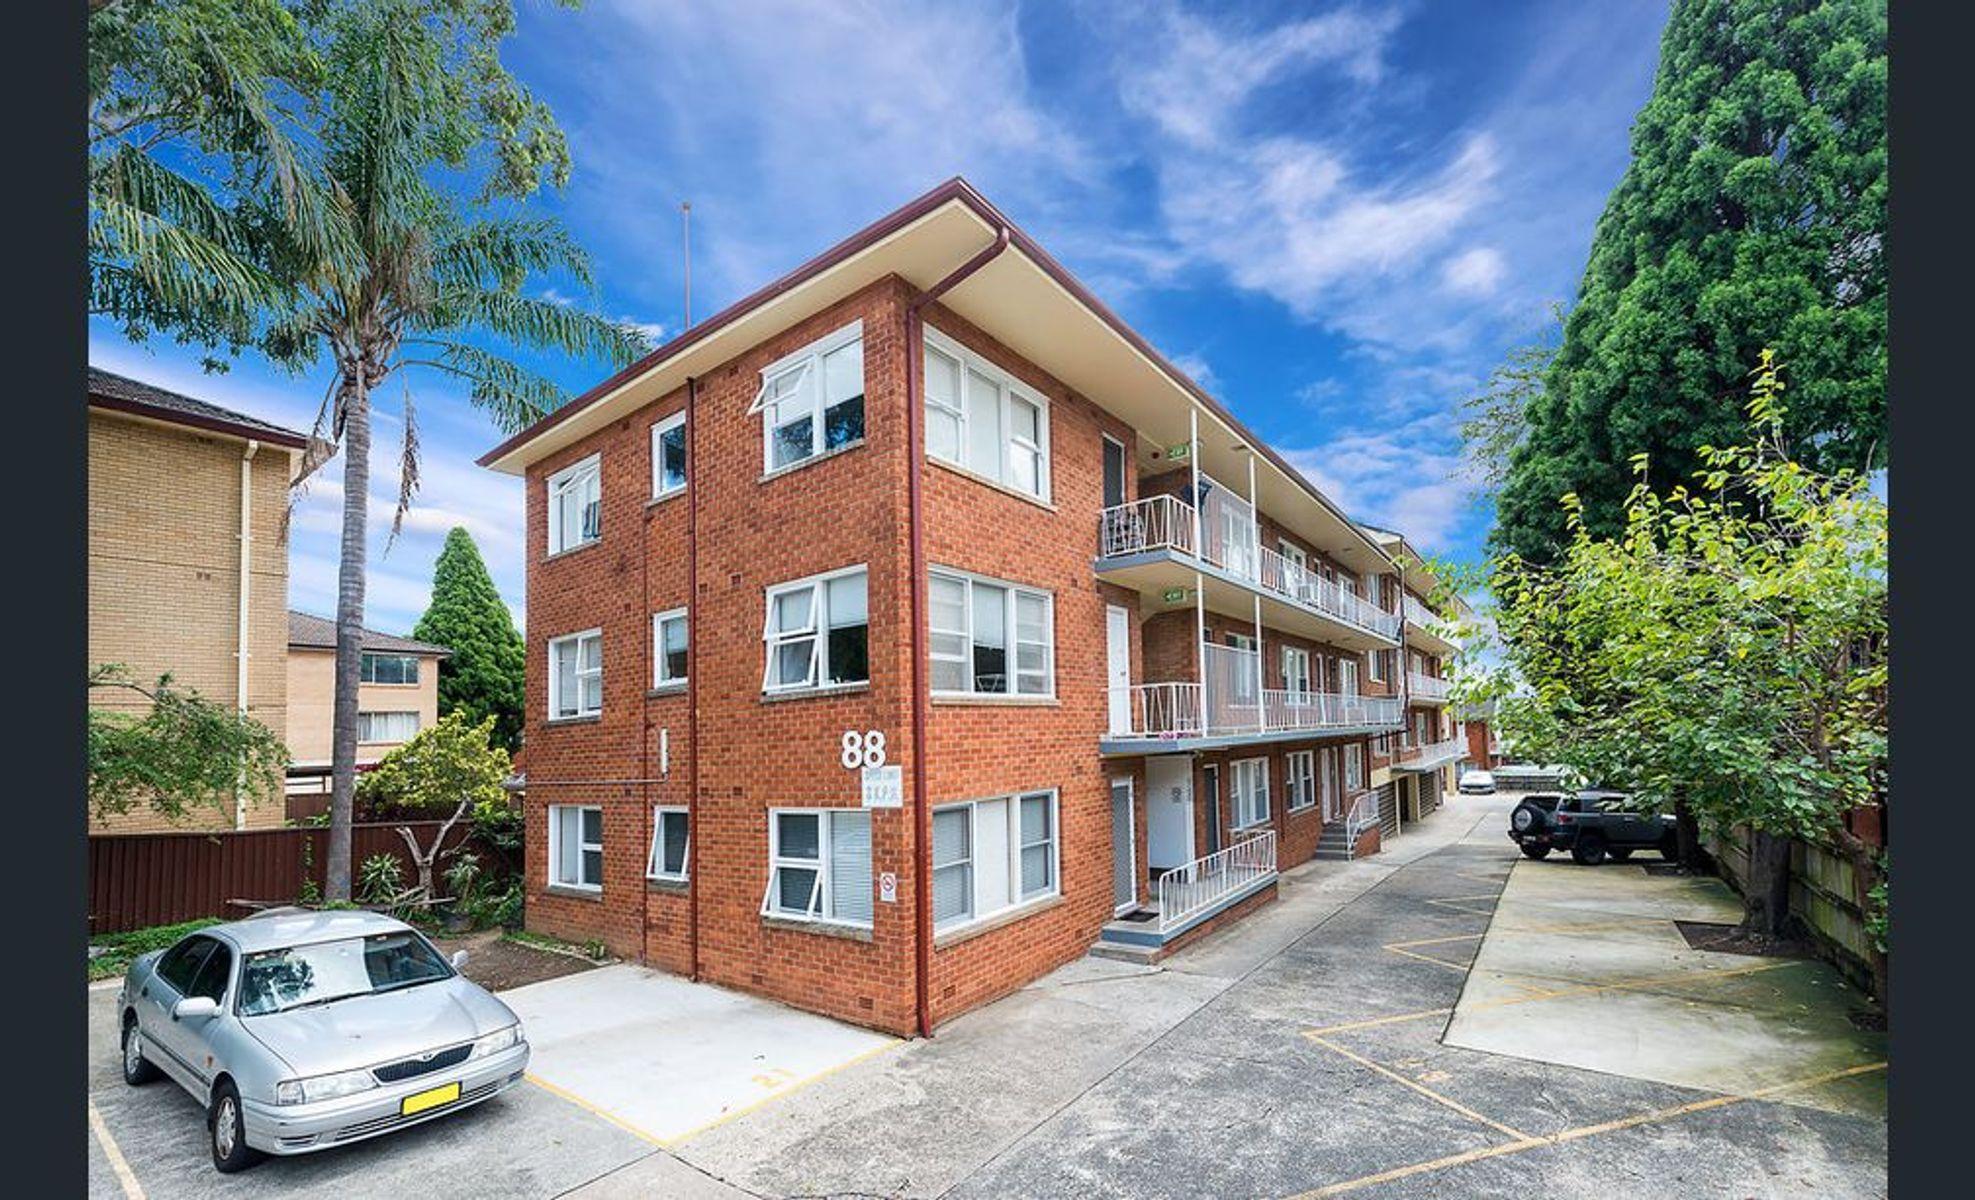 19/88 Alt Street, Ashfield, NSW 2131